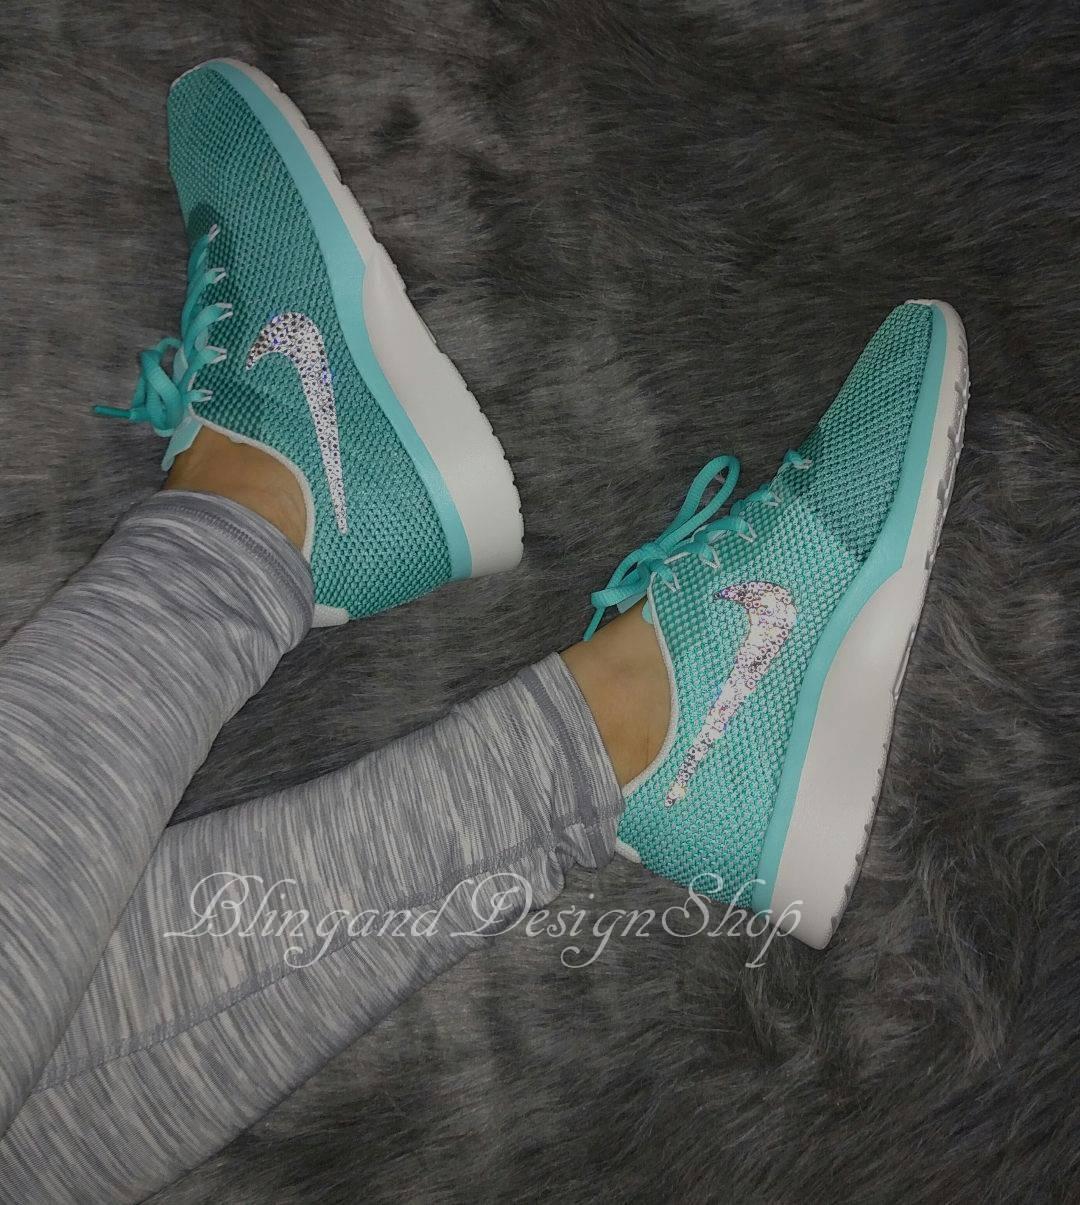 Swarovski Nike Shoes Women's Nike Tanjun Racer Teal shoes Customized with Swarovski  Crystal Rhinestones, Tennis Shoes